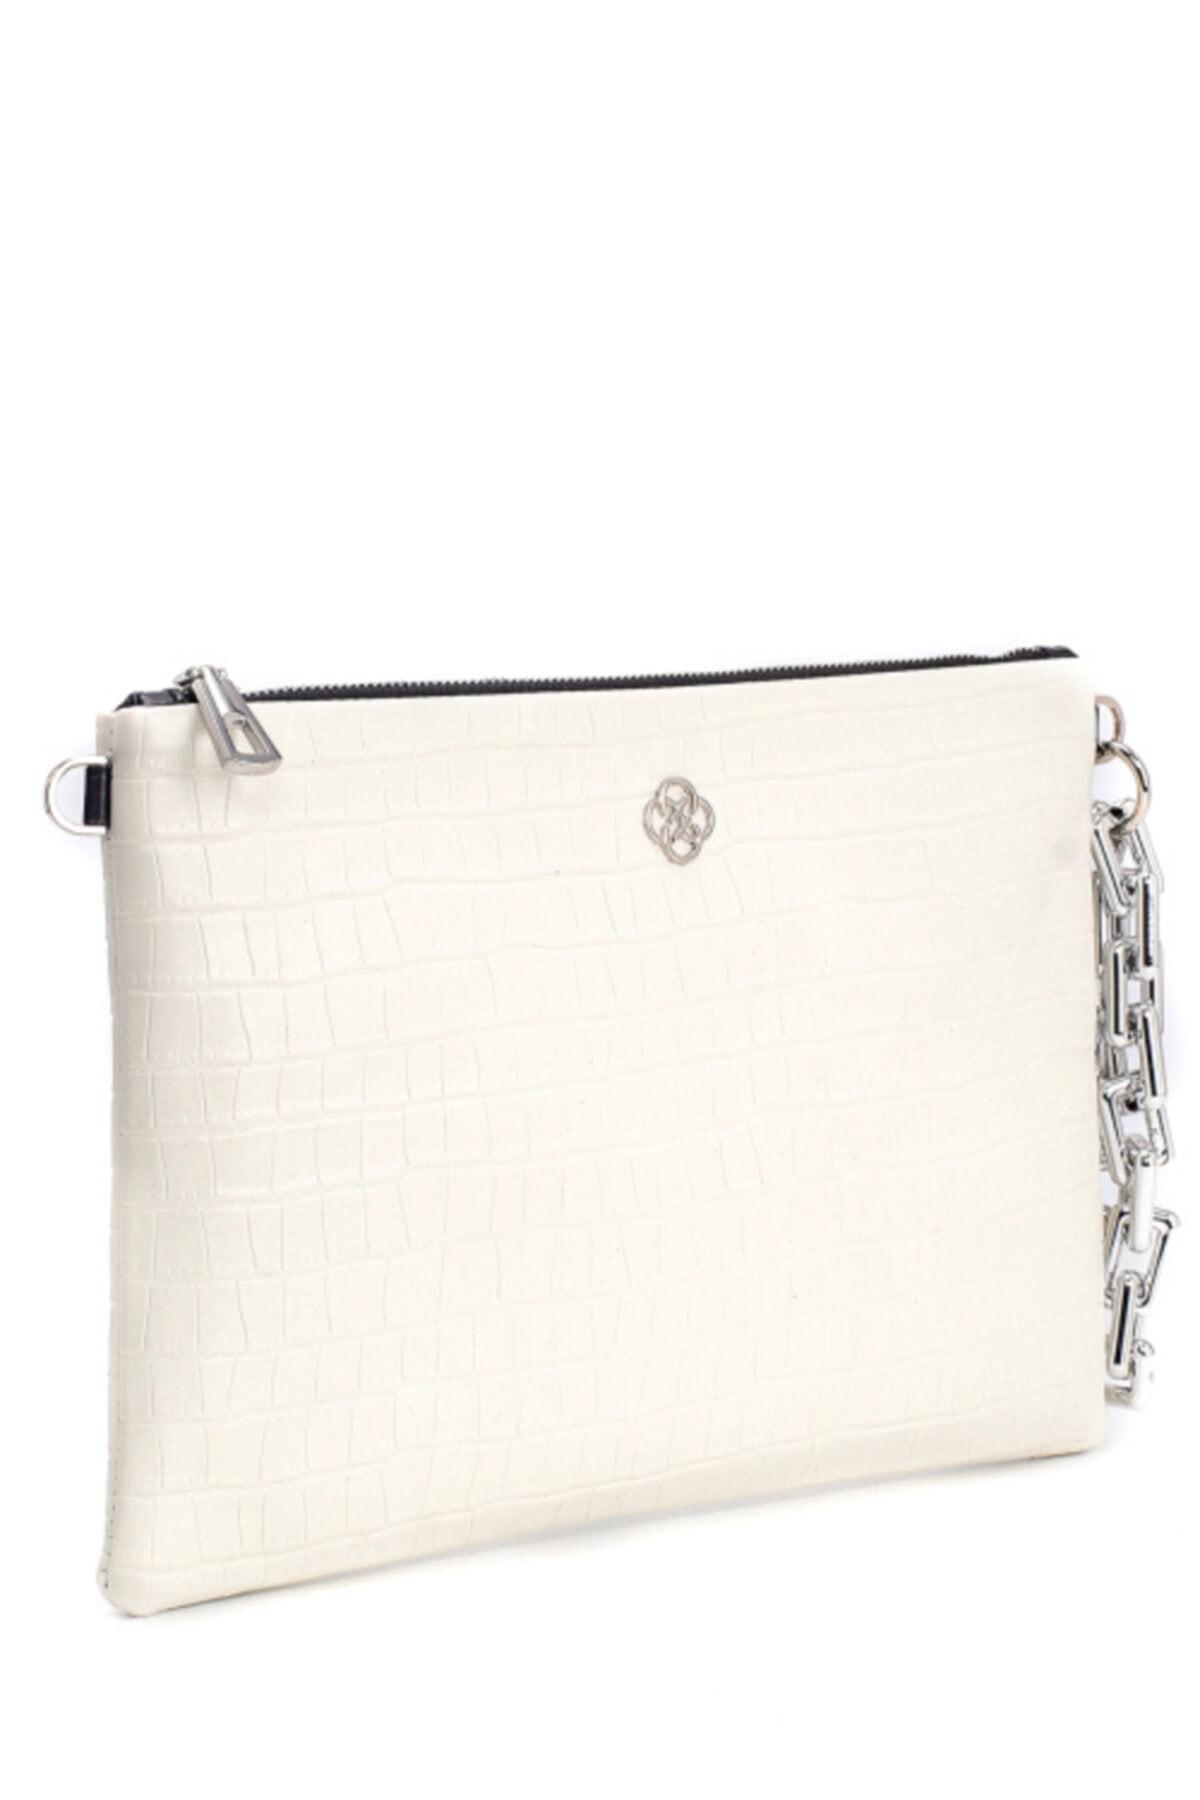 CLUTCHİST Kadın Beyaz Clutch  Çanta 2